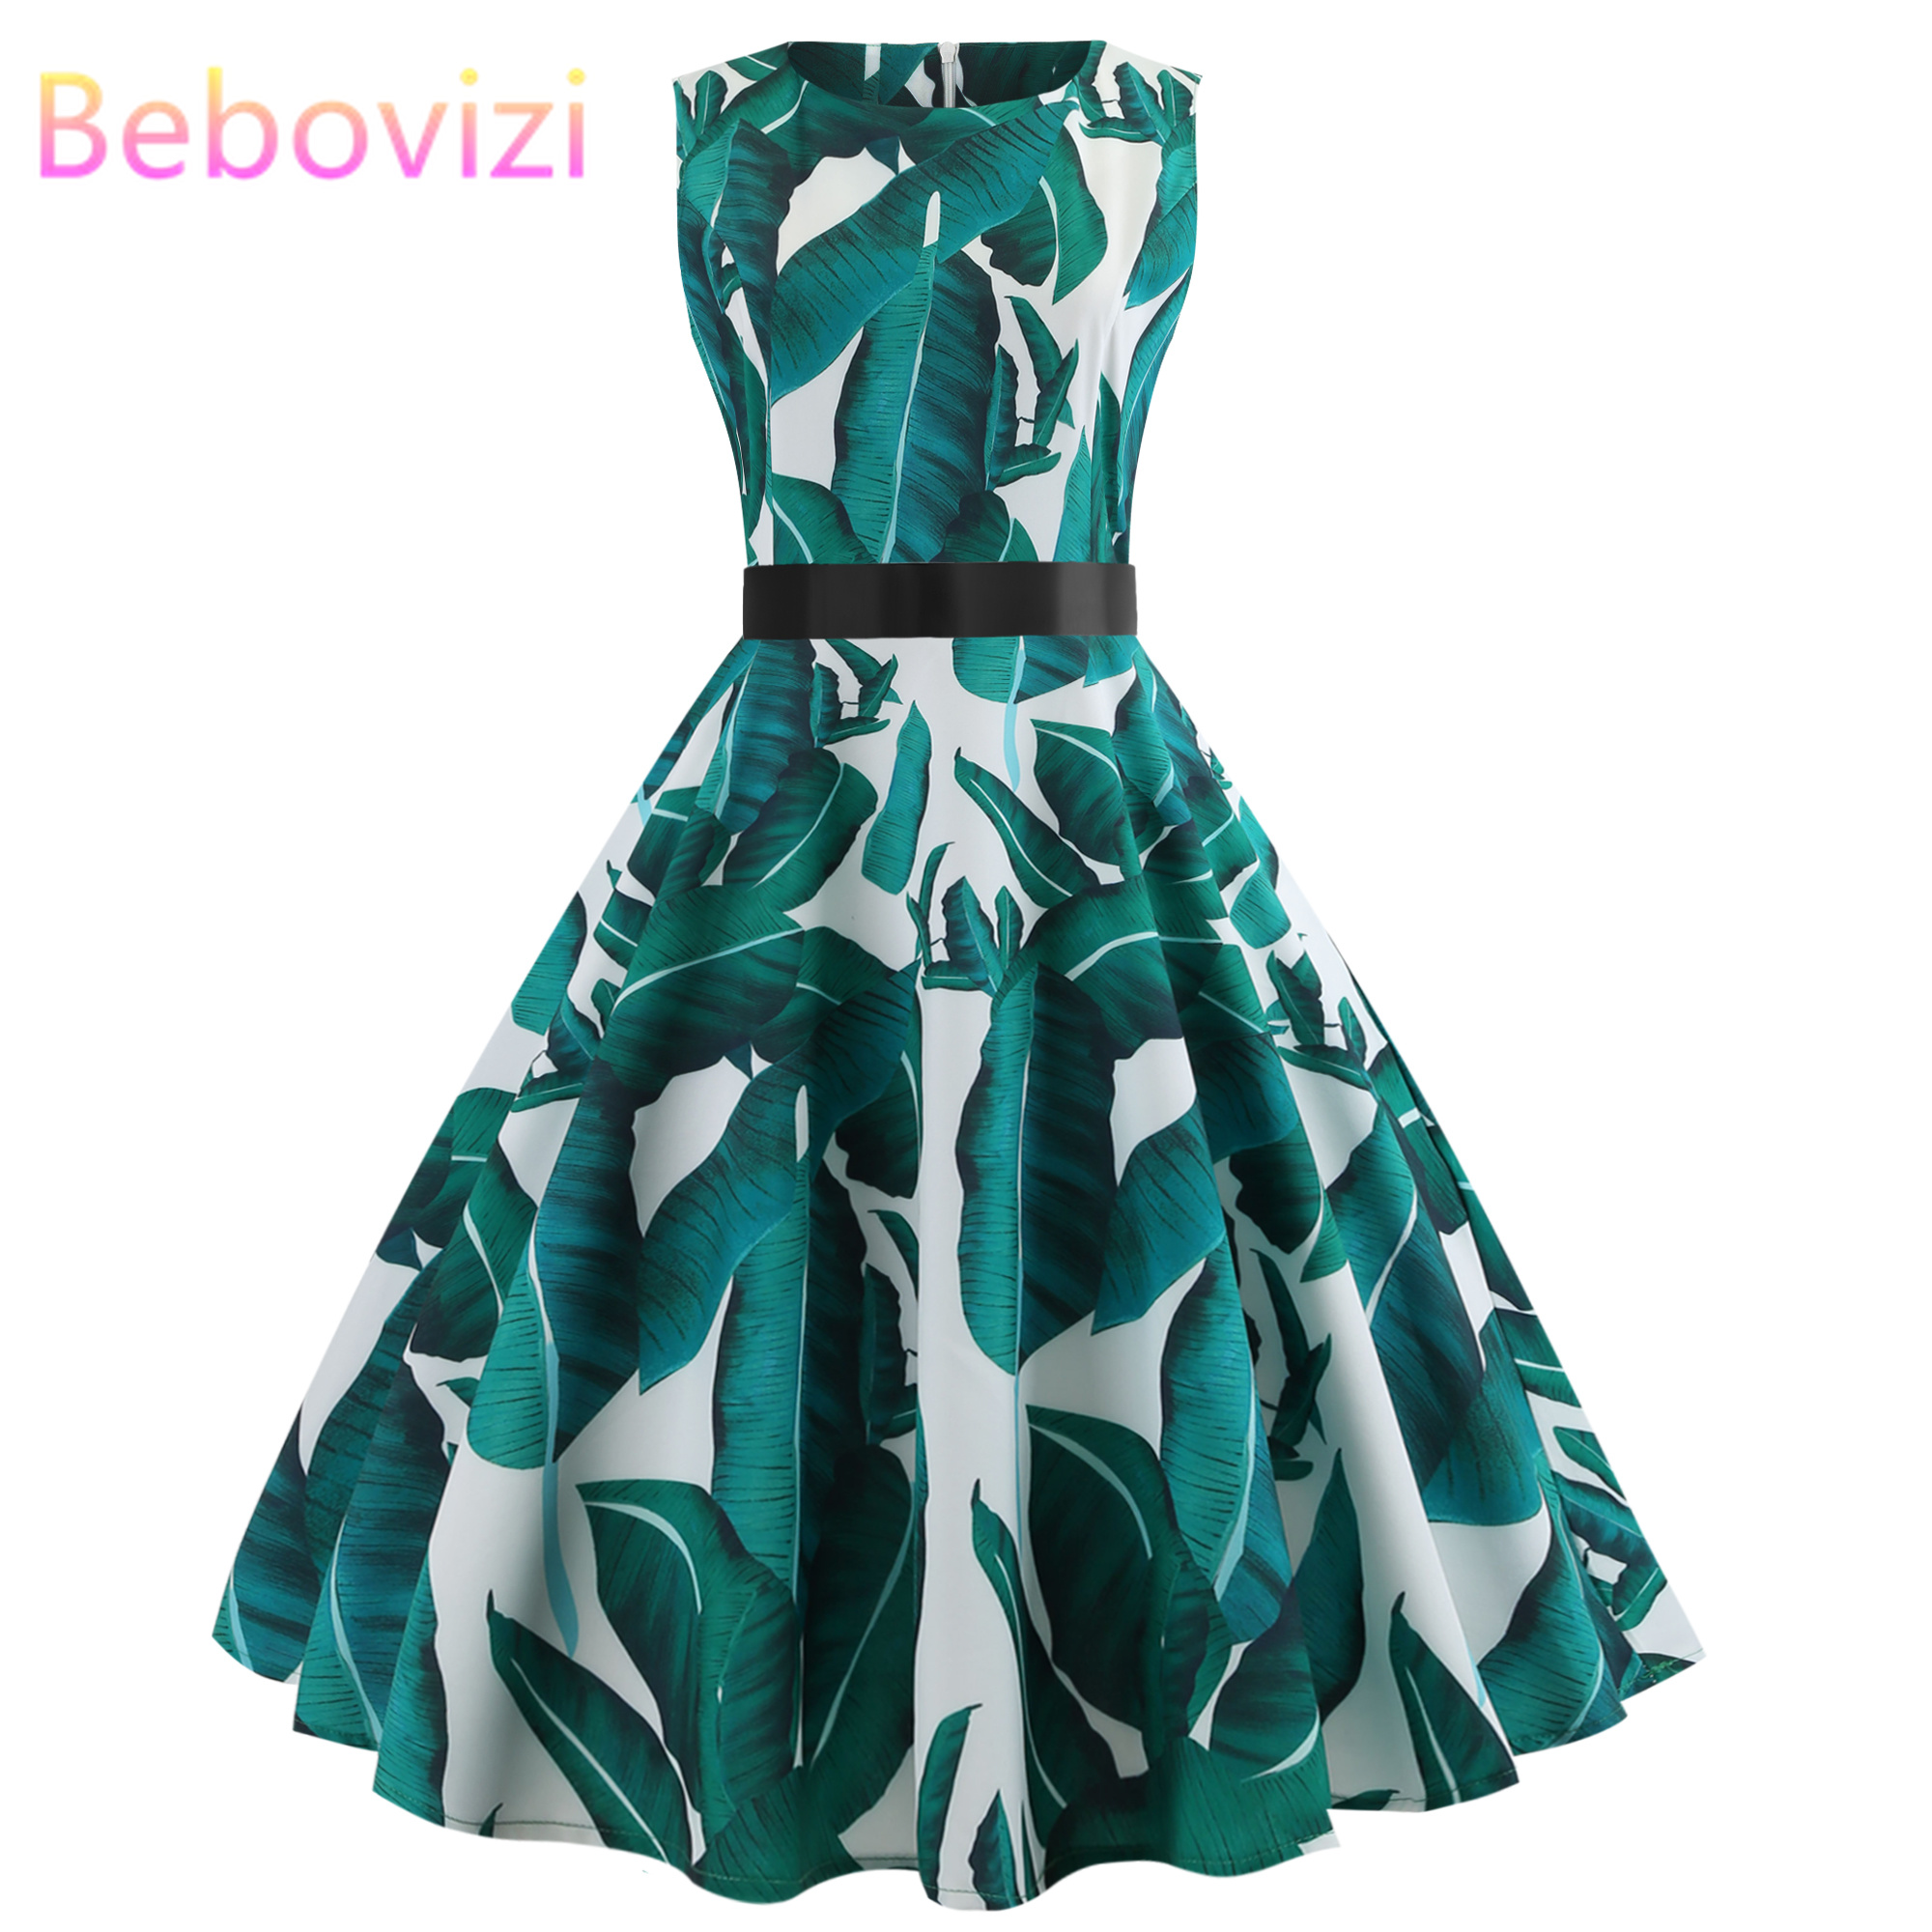 Bebovizi Fashion 2019 Summer Women Hepburn 50s Vintage Floral Print Sleeveless Retro Swing Casual Elegant Party Bandage Dress